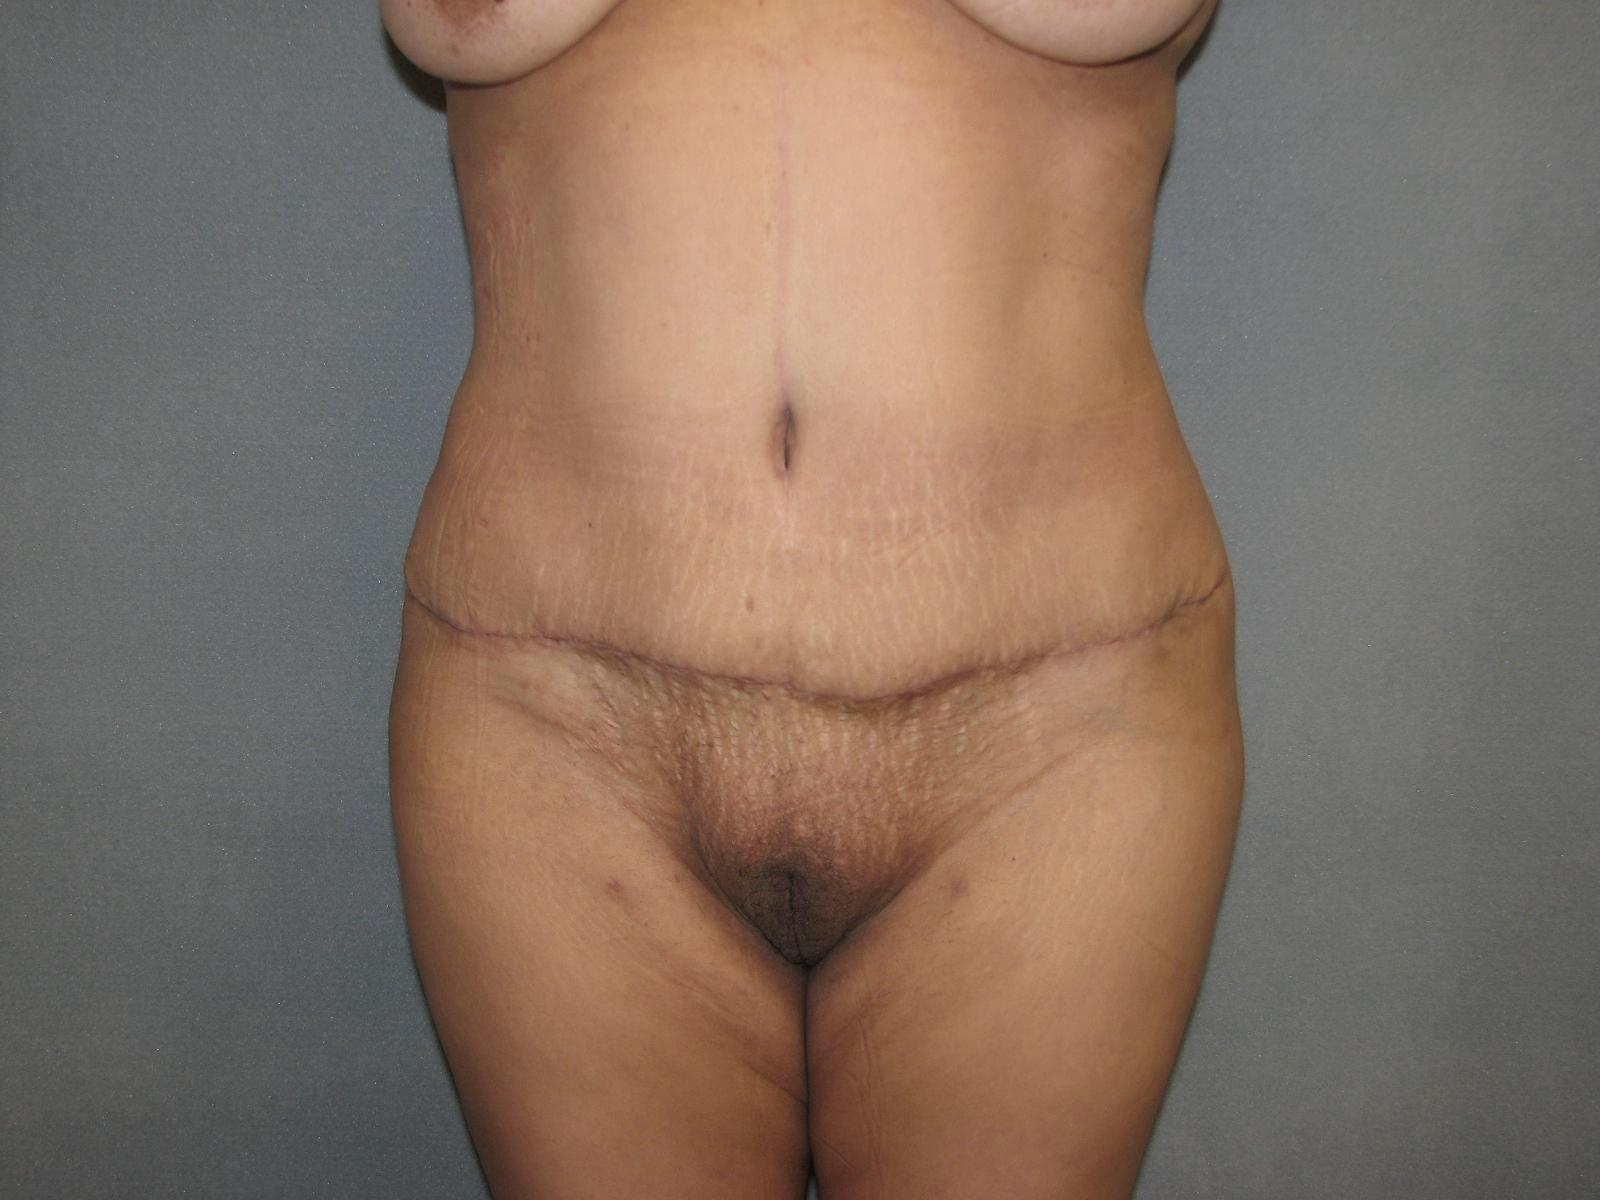 Kerry Katona Shows Off Her Honed New Figure Post Tummy